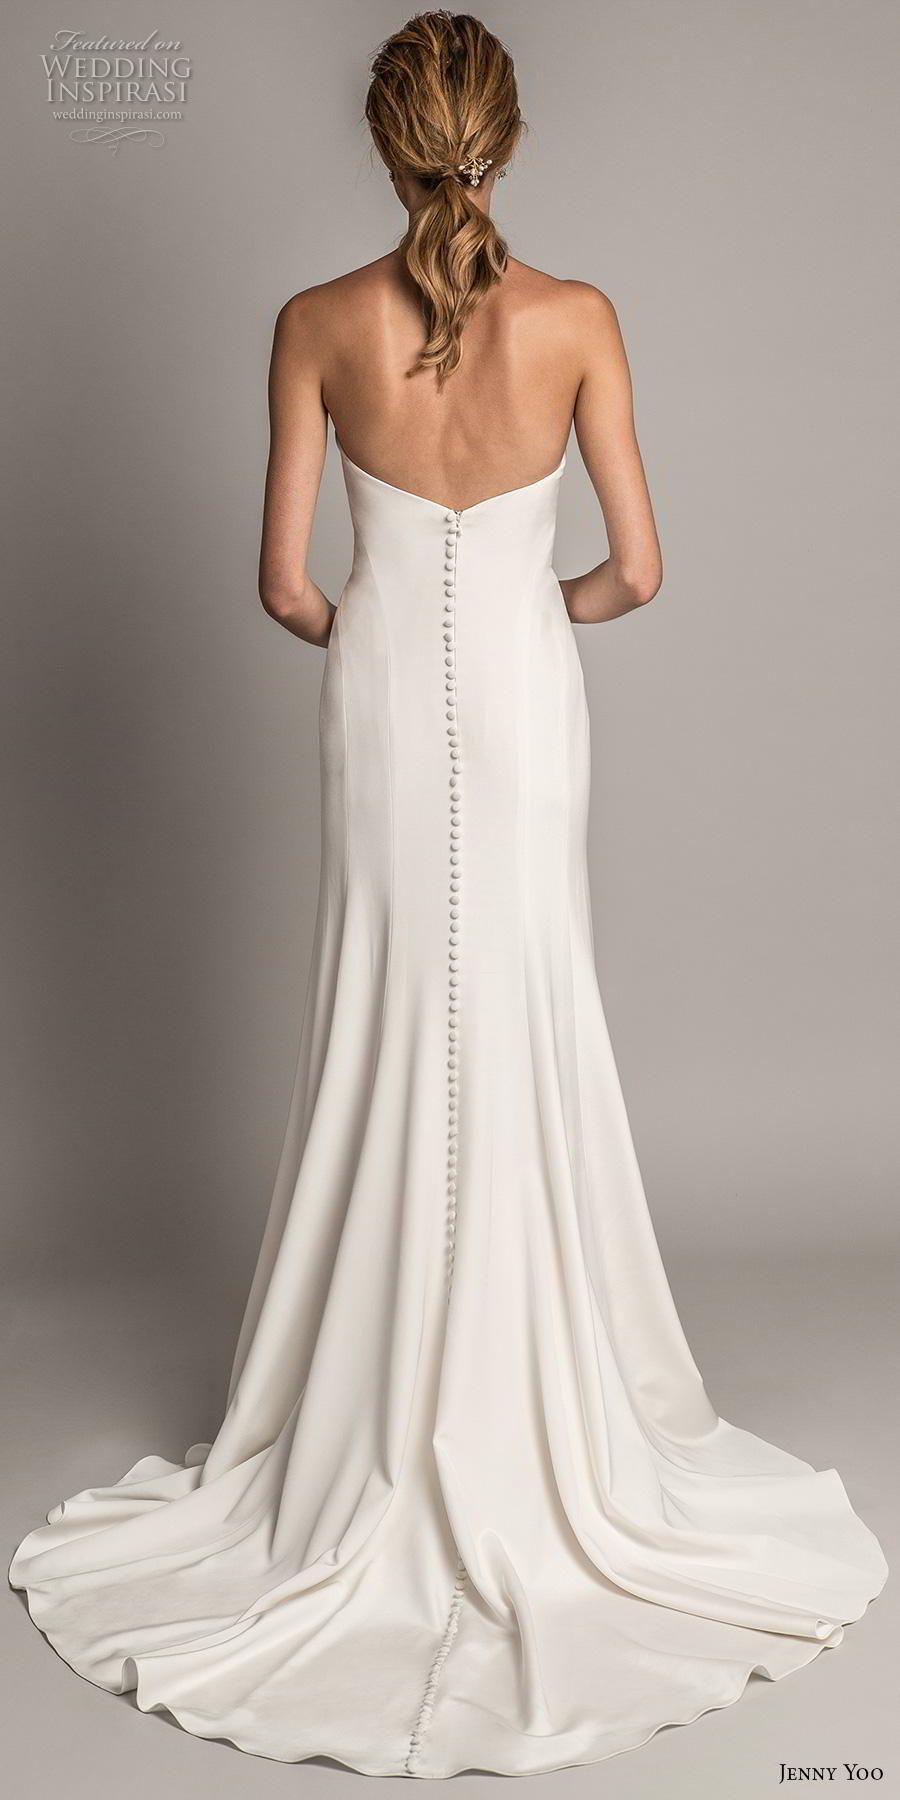 Jenny yoo spring wedding dresses in wedding pinterest